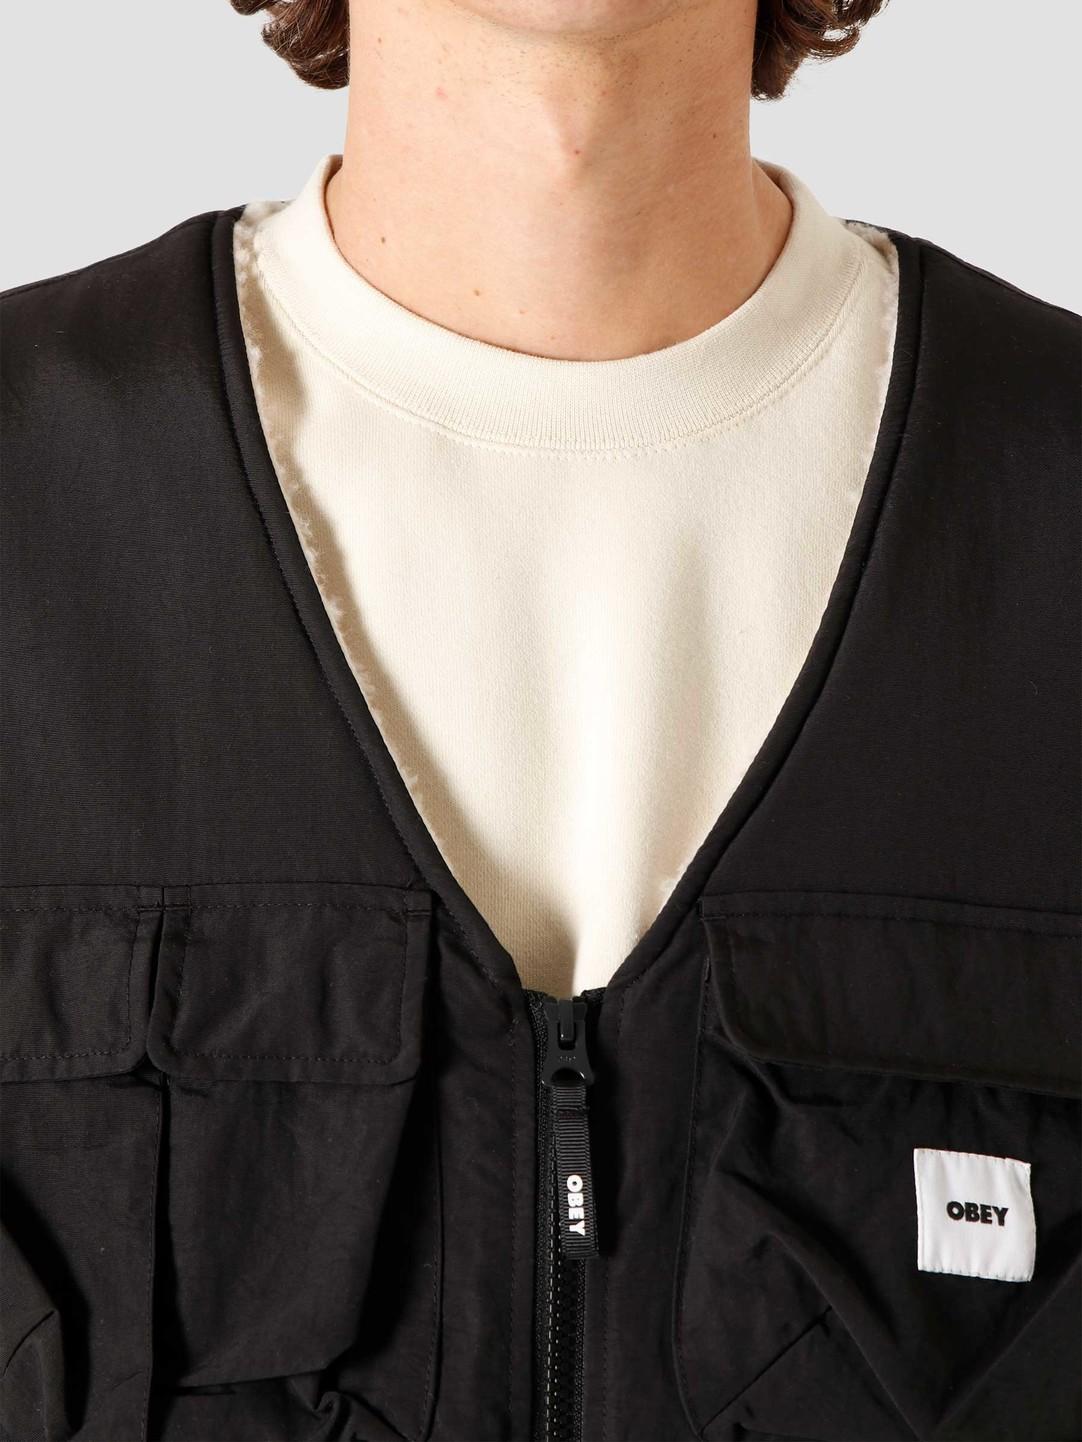 Obey Obey External Vest Black 121810012BLK